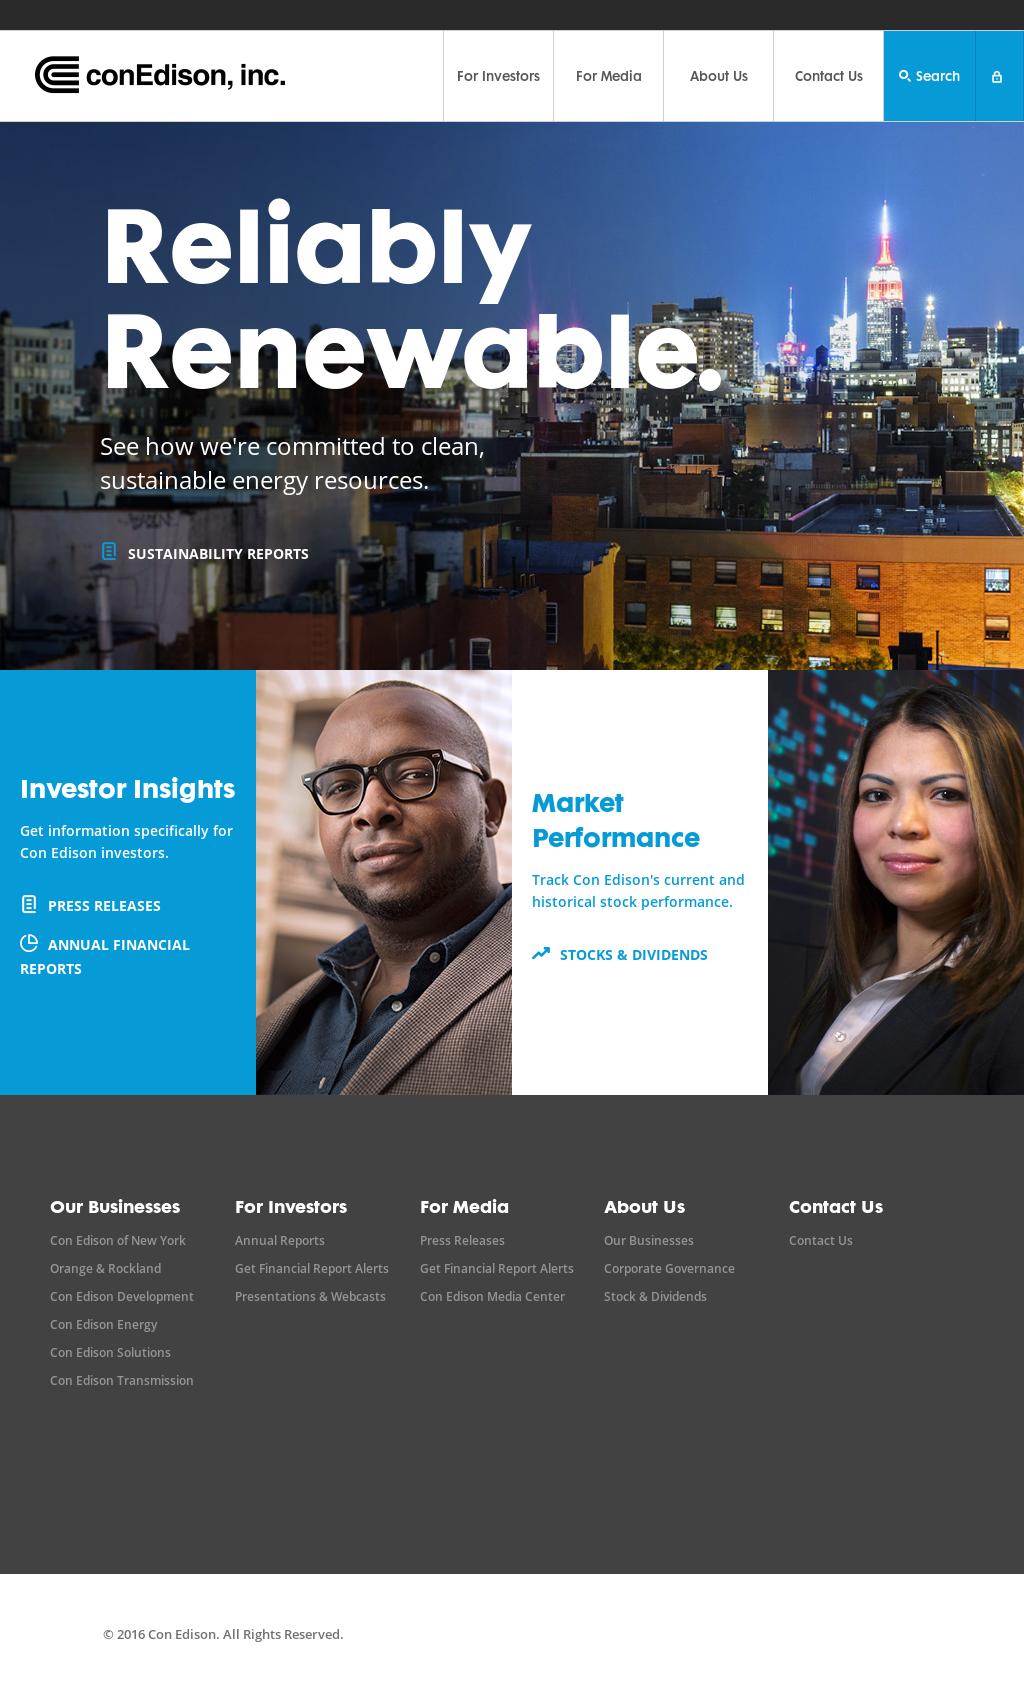 Con Edison Competitors, Revenue and Employees - Owler